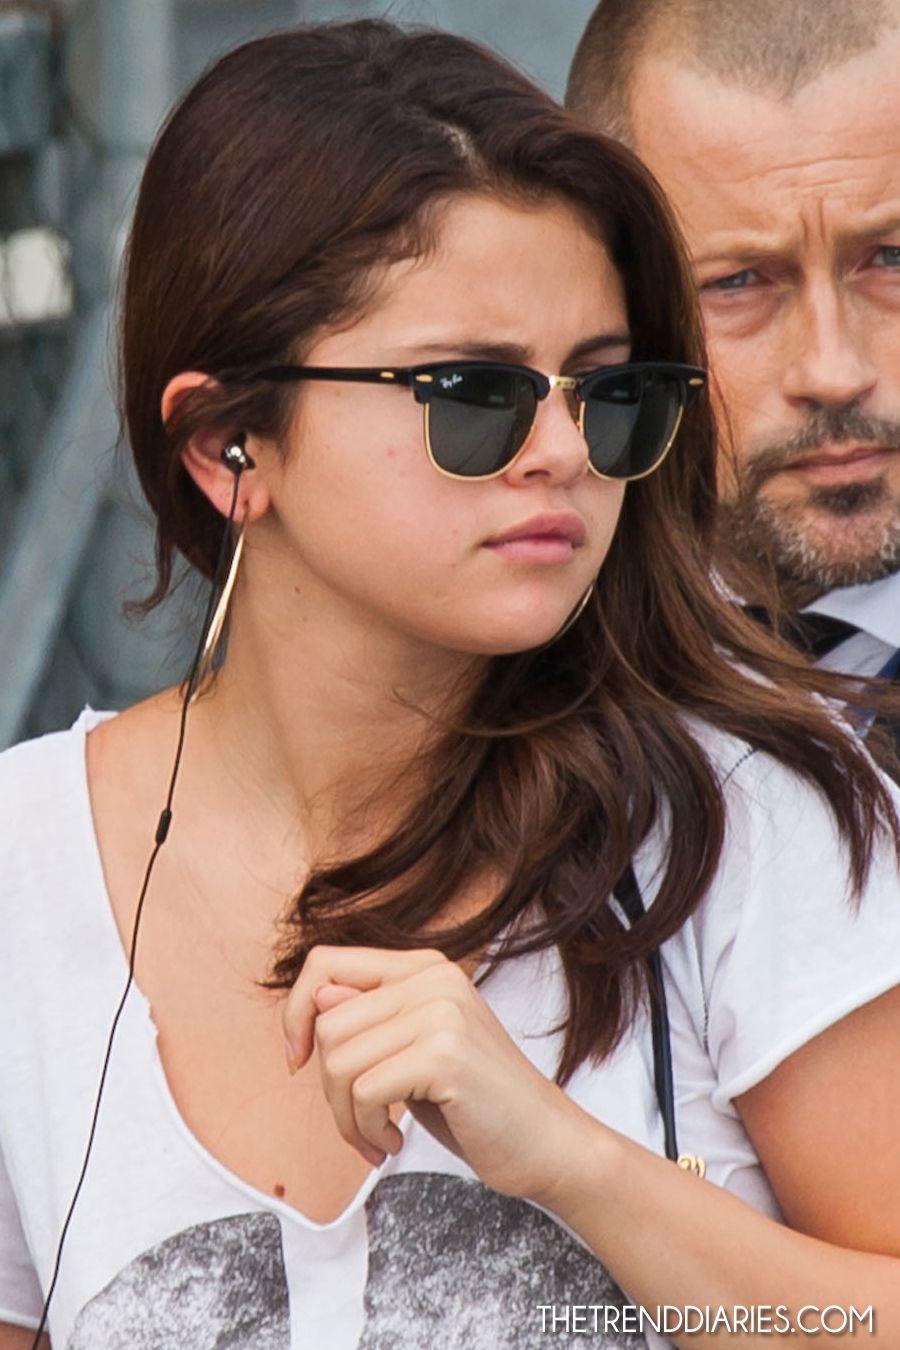 Men's Sunglasses: Latest Styles, Fashion, Trends ... - GQ